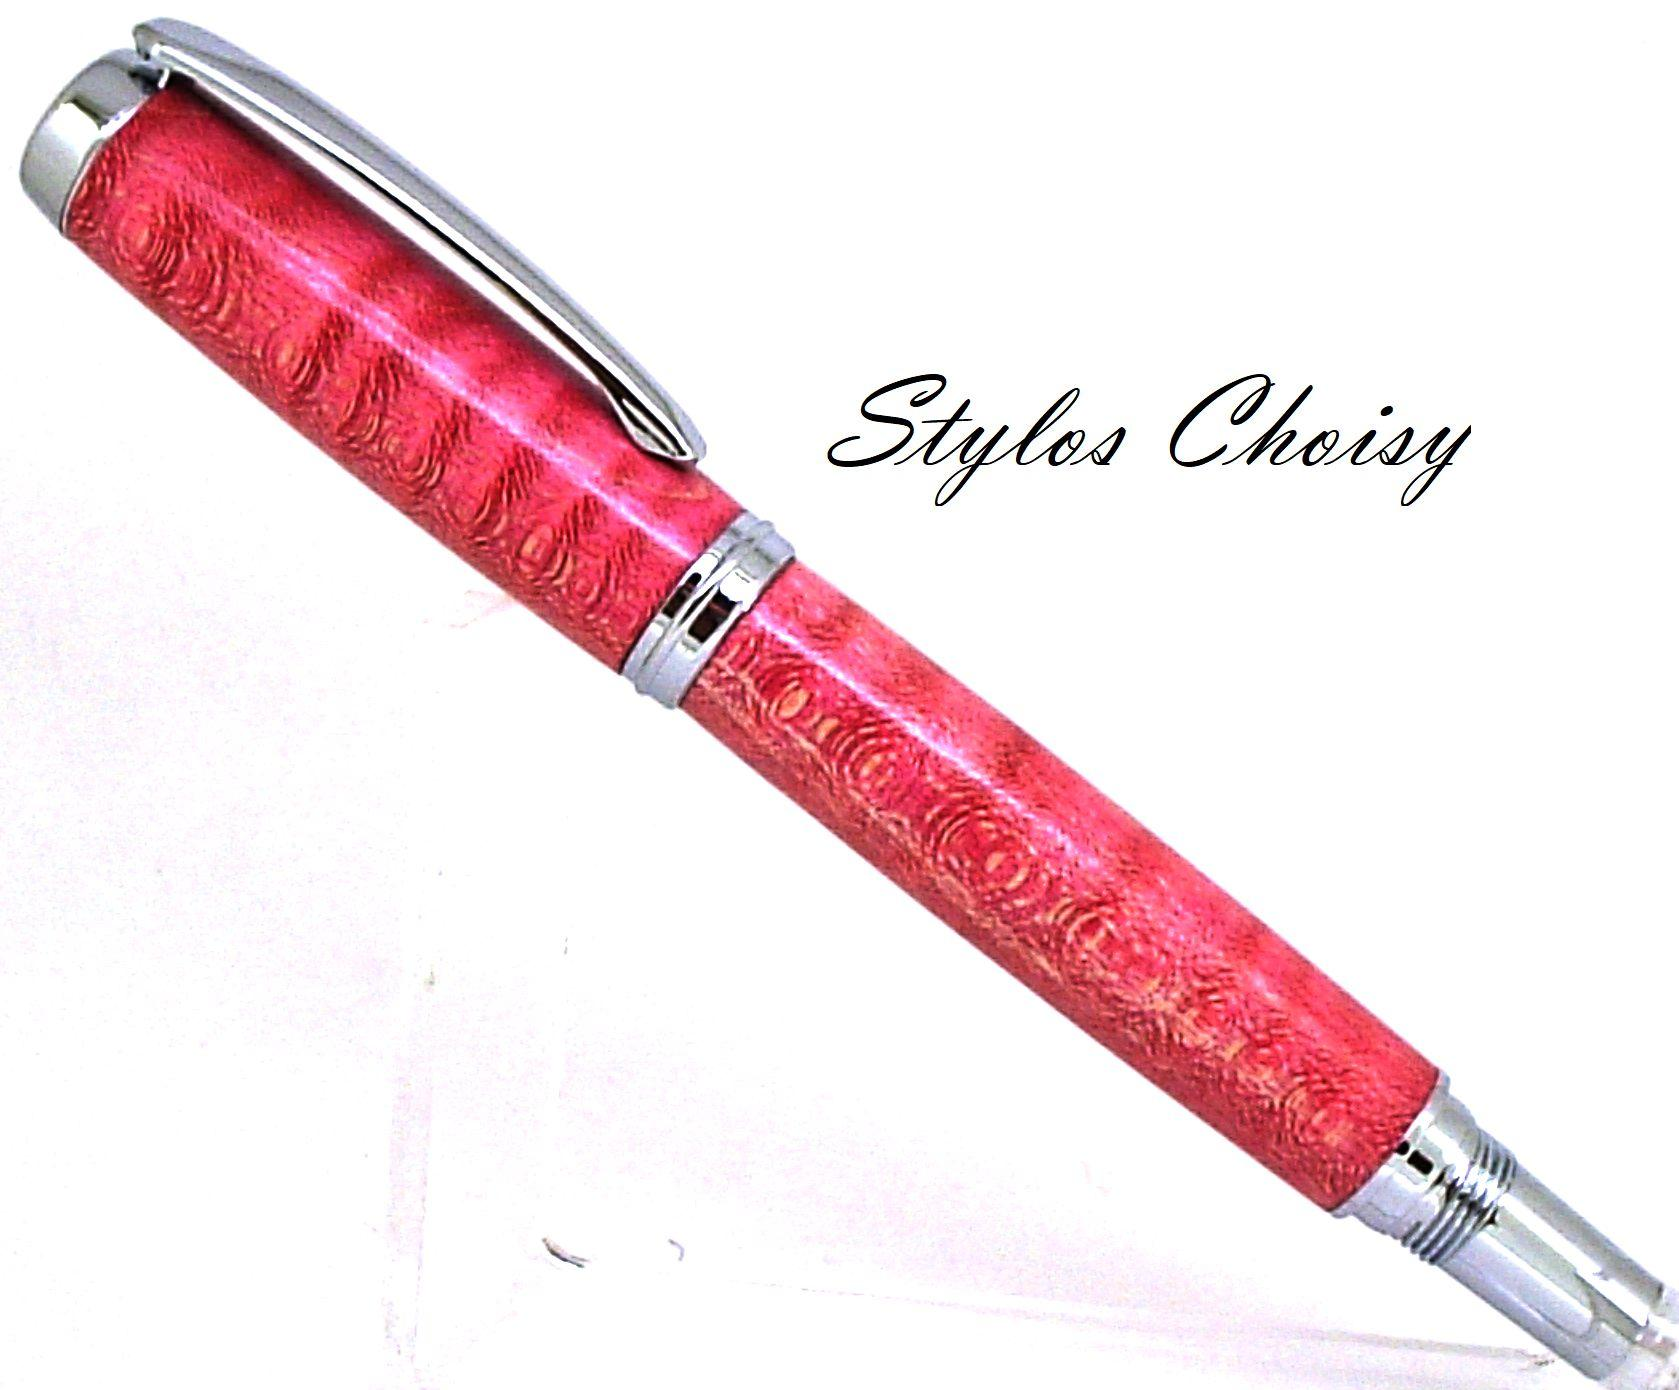 Roller decouverte erable sycomore onde ecostabilise rose rouge et chrome 1